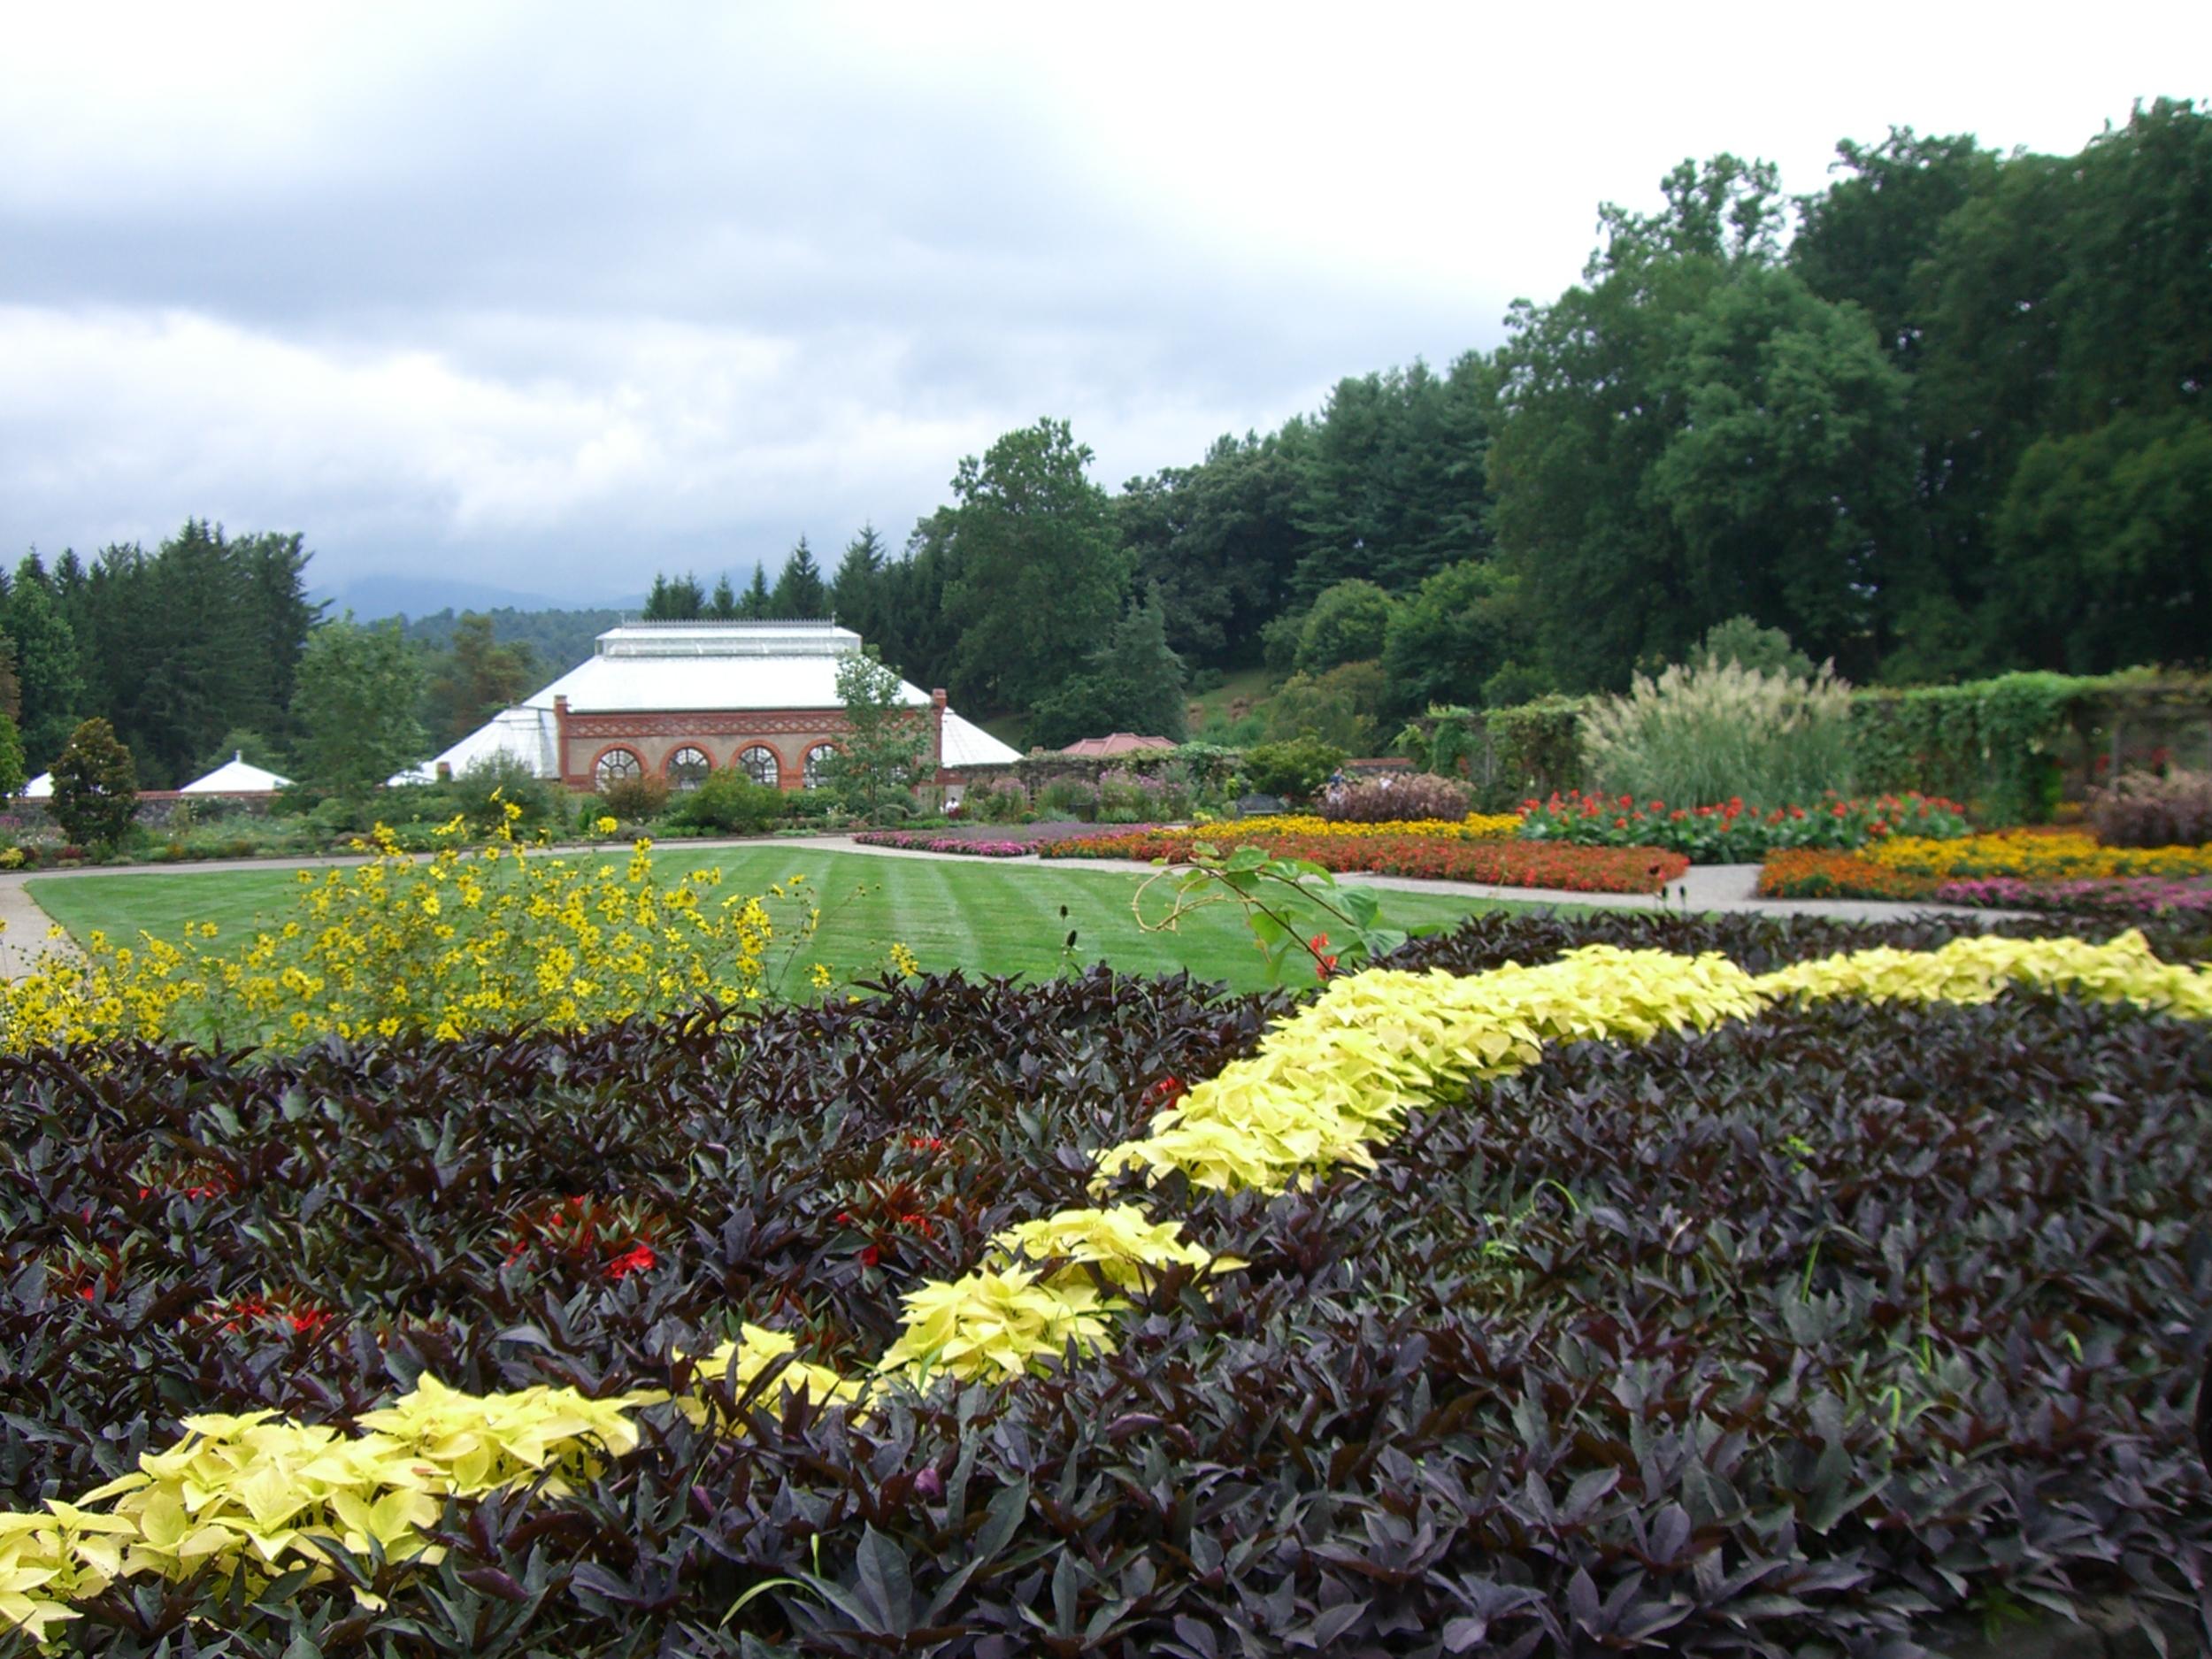 Biltmore gardens by Gillham